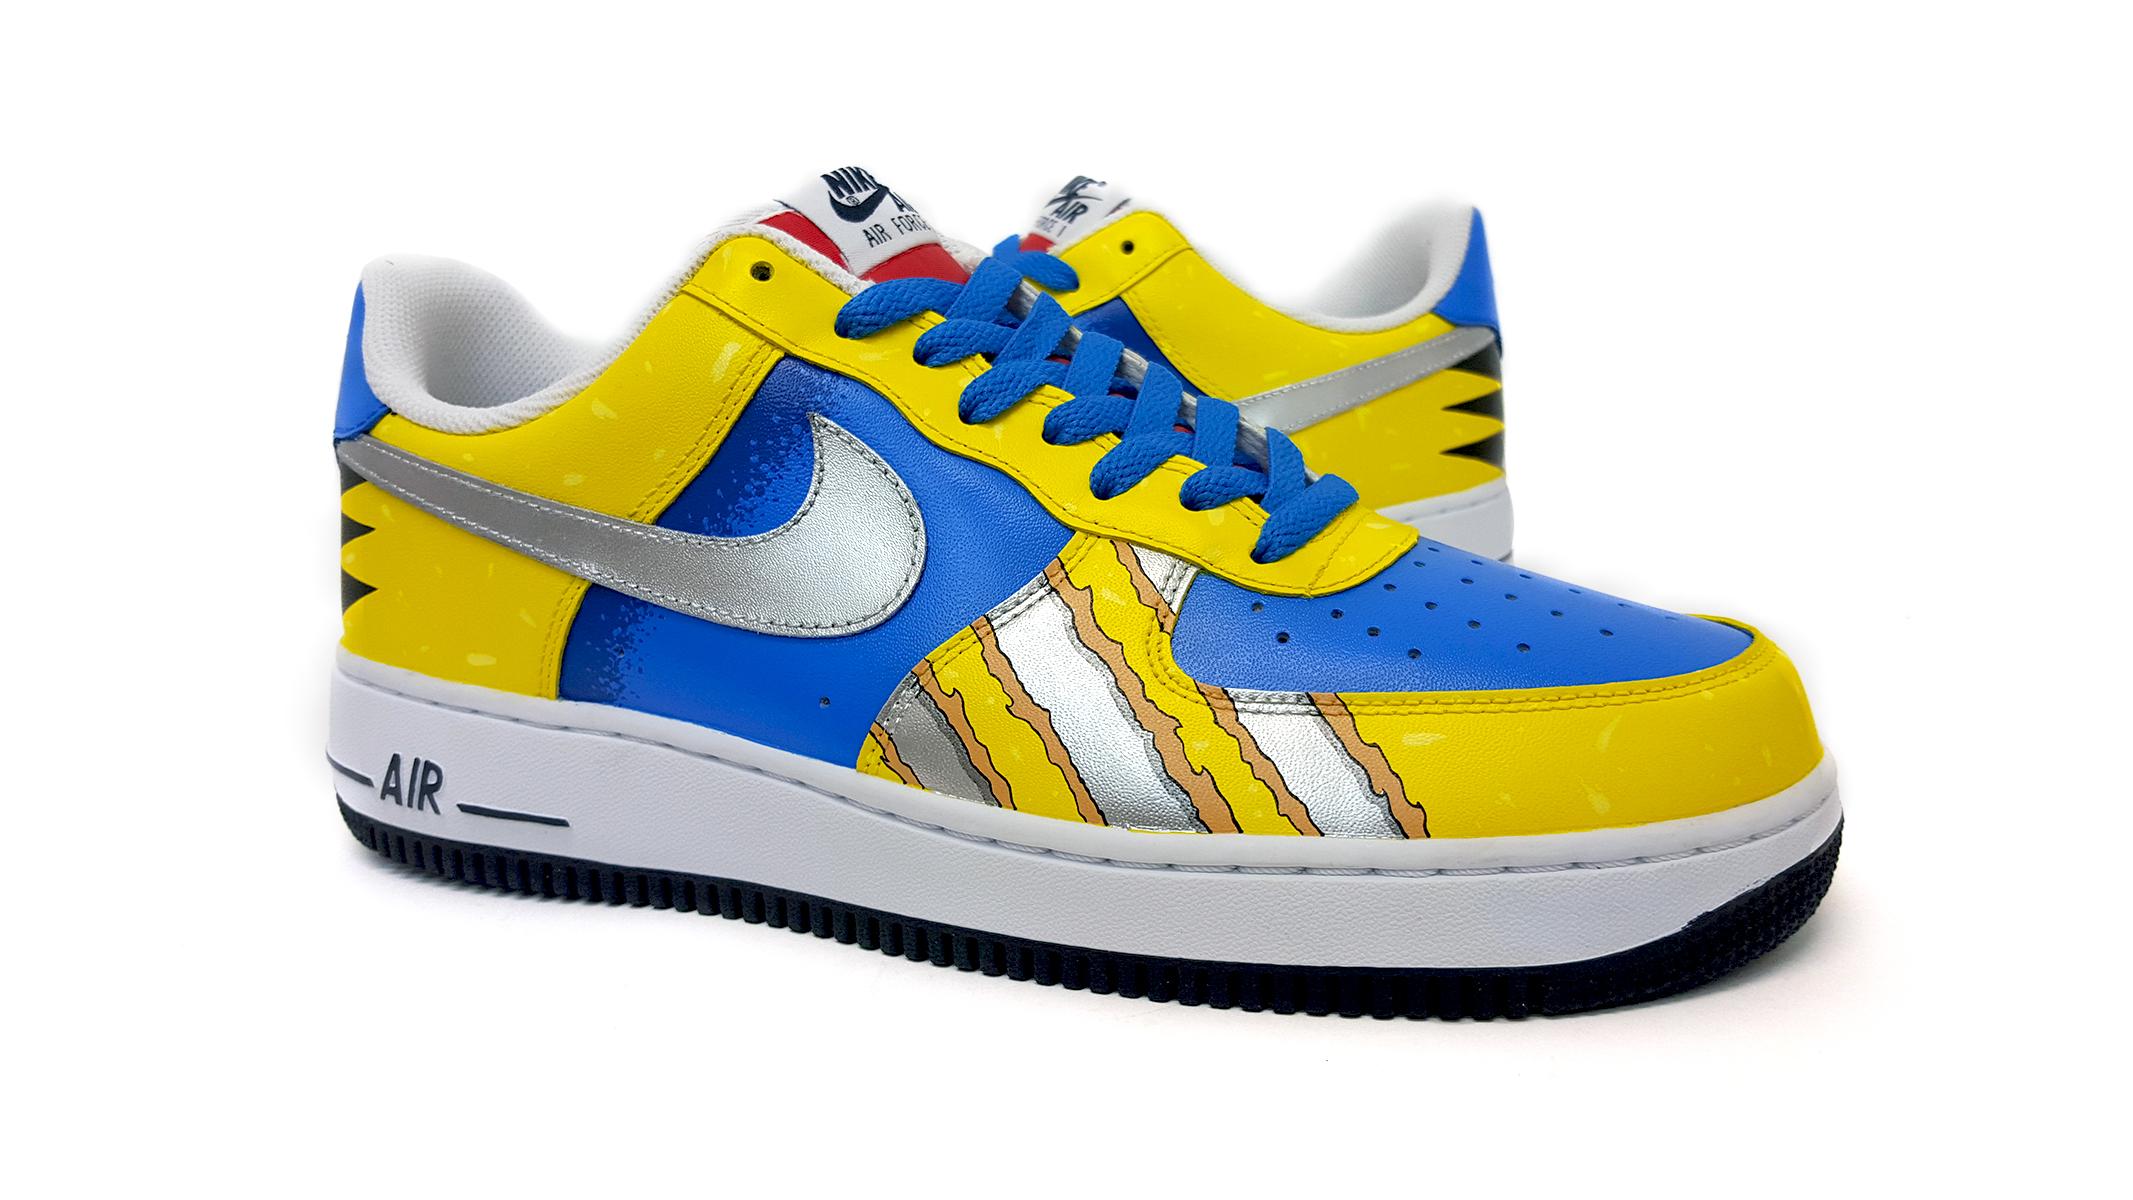 ce257ffc45af sekure d wolverine 2.jpg. Tags  Sekure D · Nike · Sekure D Custom · Sekure D  Customs · Sneakers · Air Force 1 ...